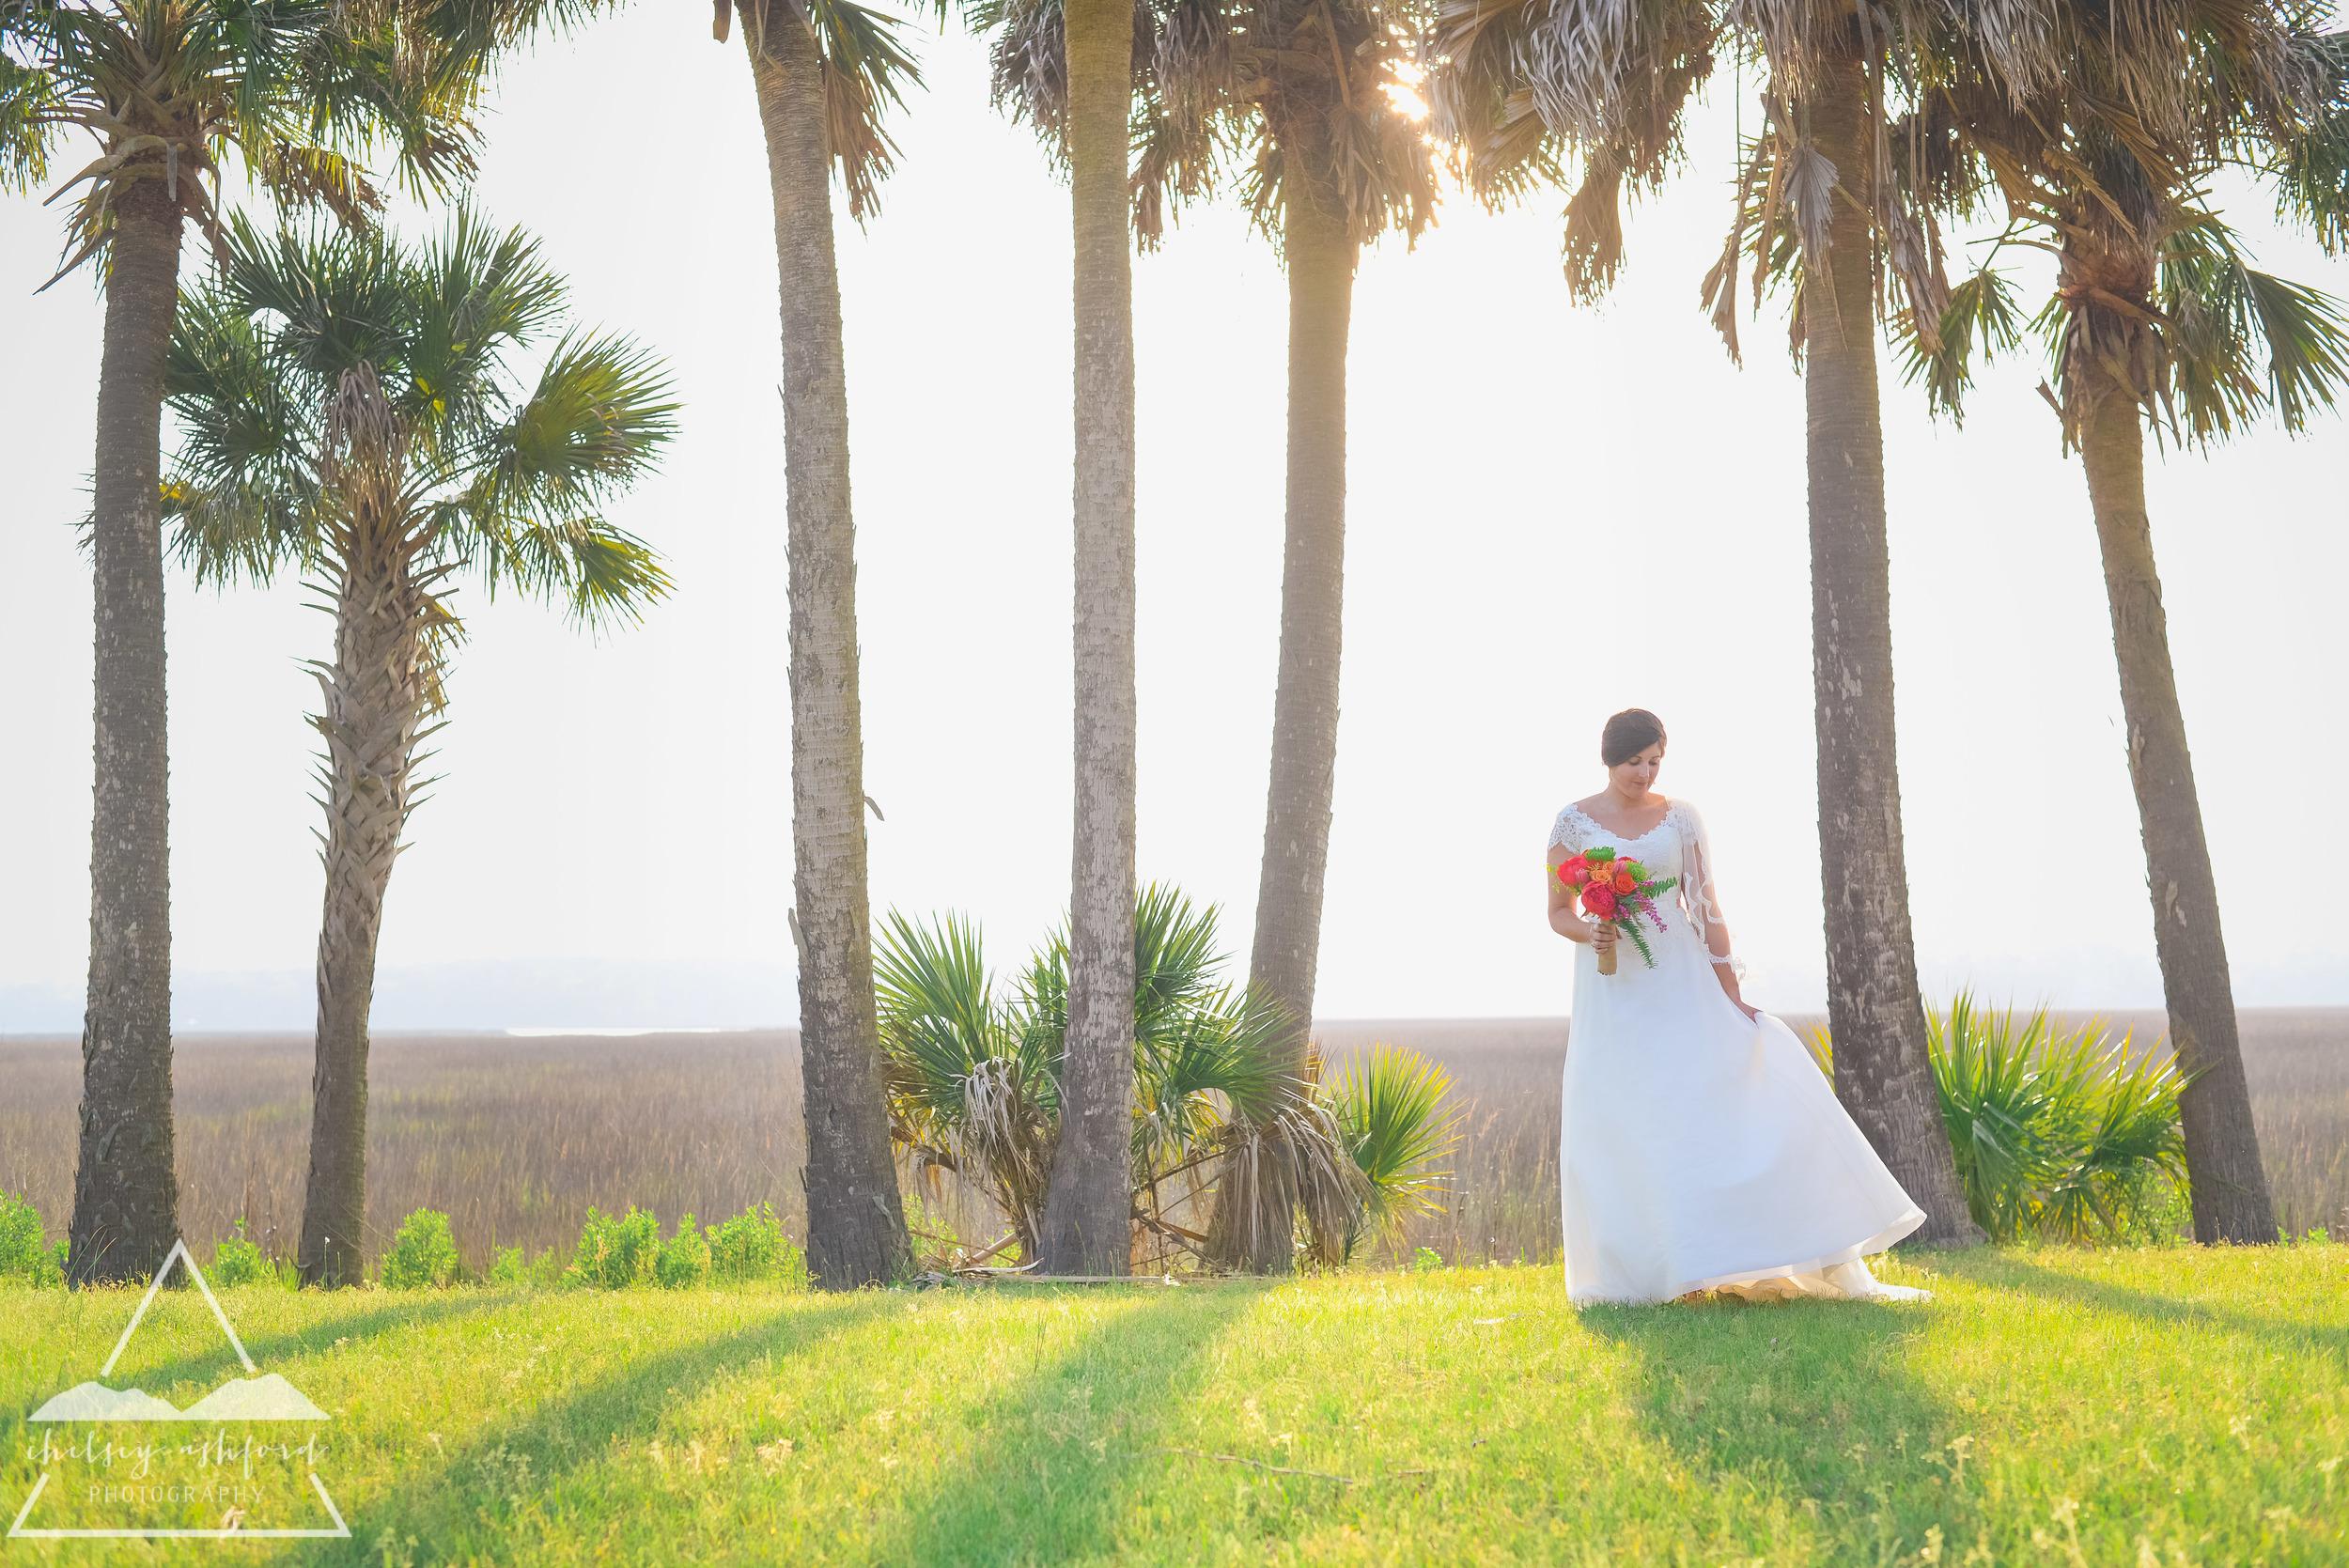 Sylvia_bridals_web-30.jpg